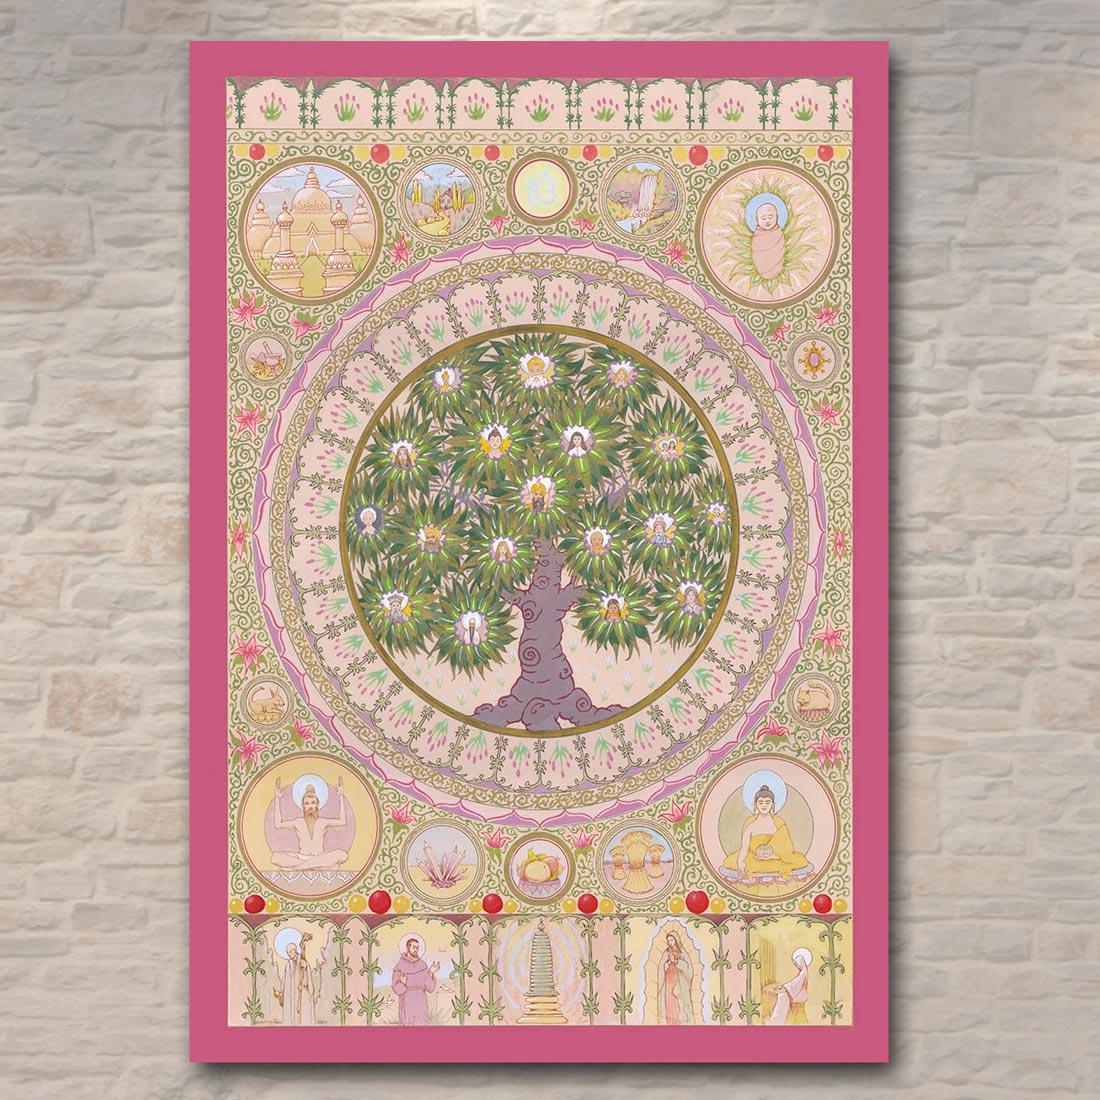 Prosperity Mandala Poster, aprox. 32 x 47 cm